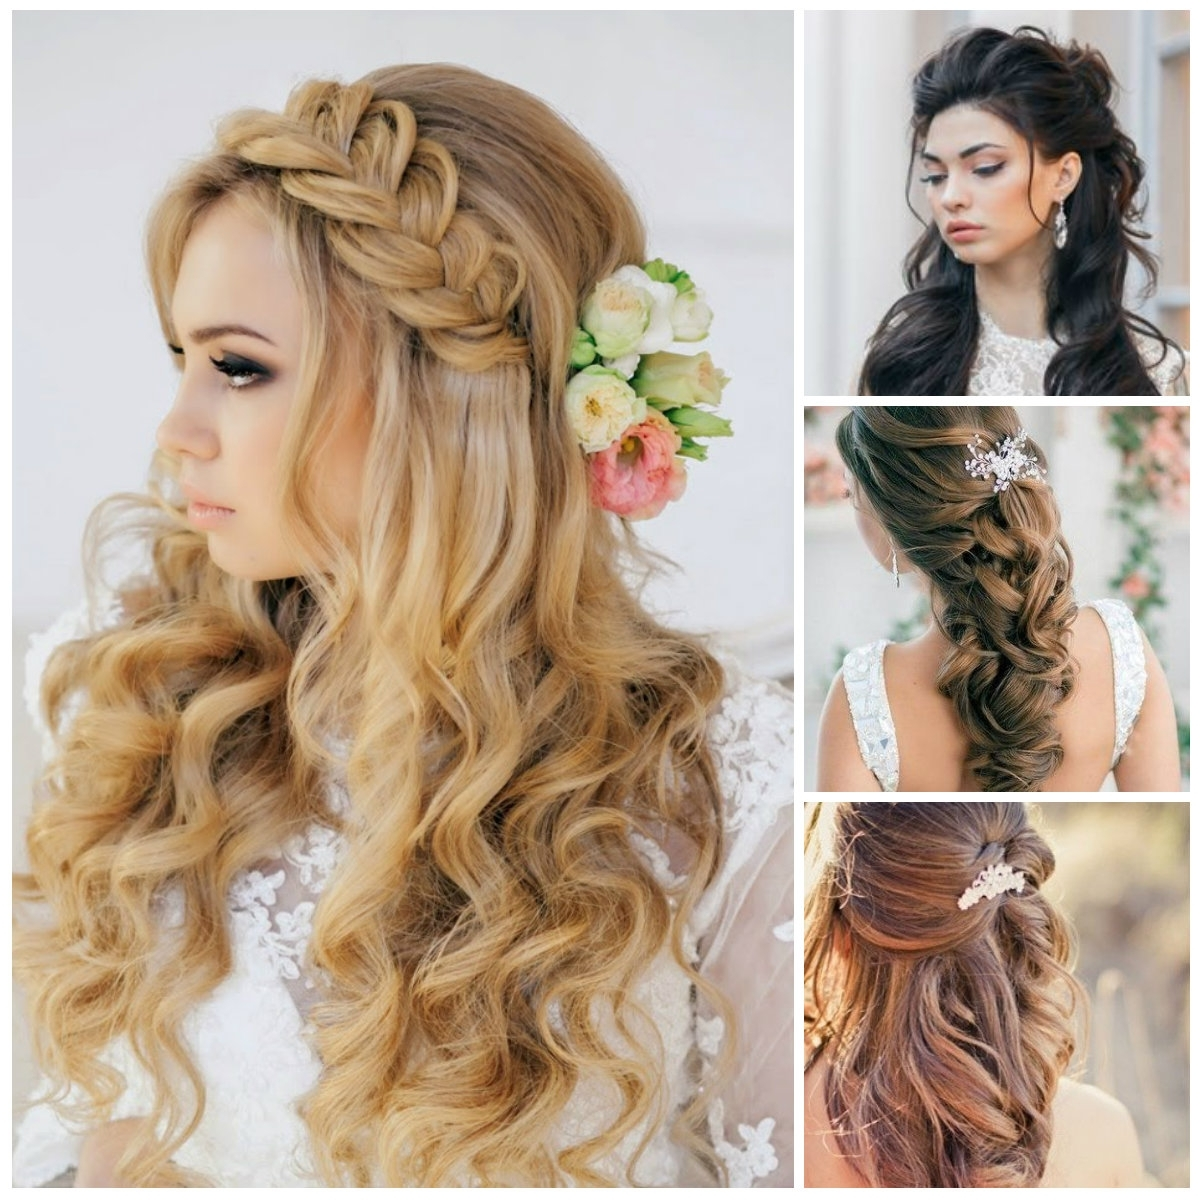 Wedding Half Half Hairstyles For 2018 – 2019 – Best Hairstyles Ideas For Current Wedding Hairstyles For Long Wavy Hair (View 8 of 15)